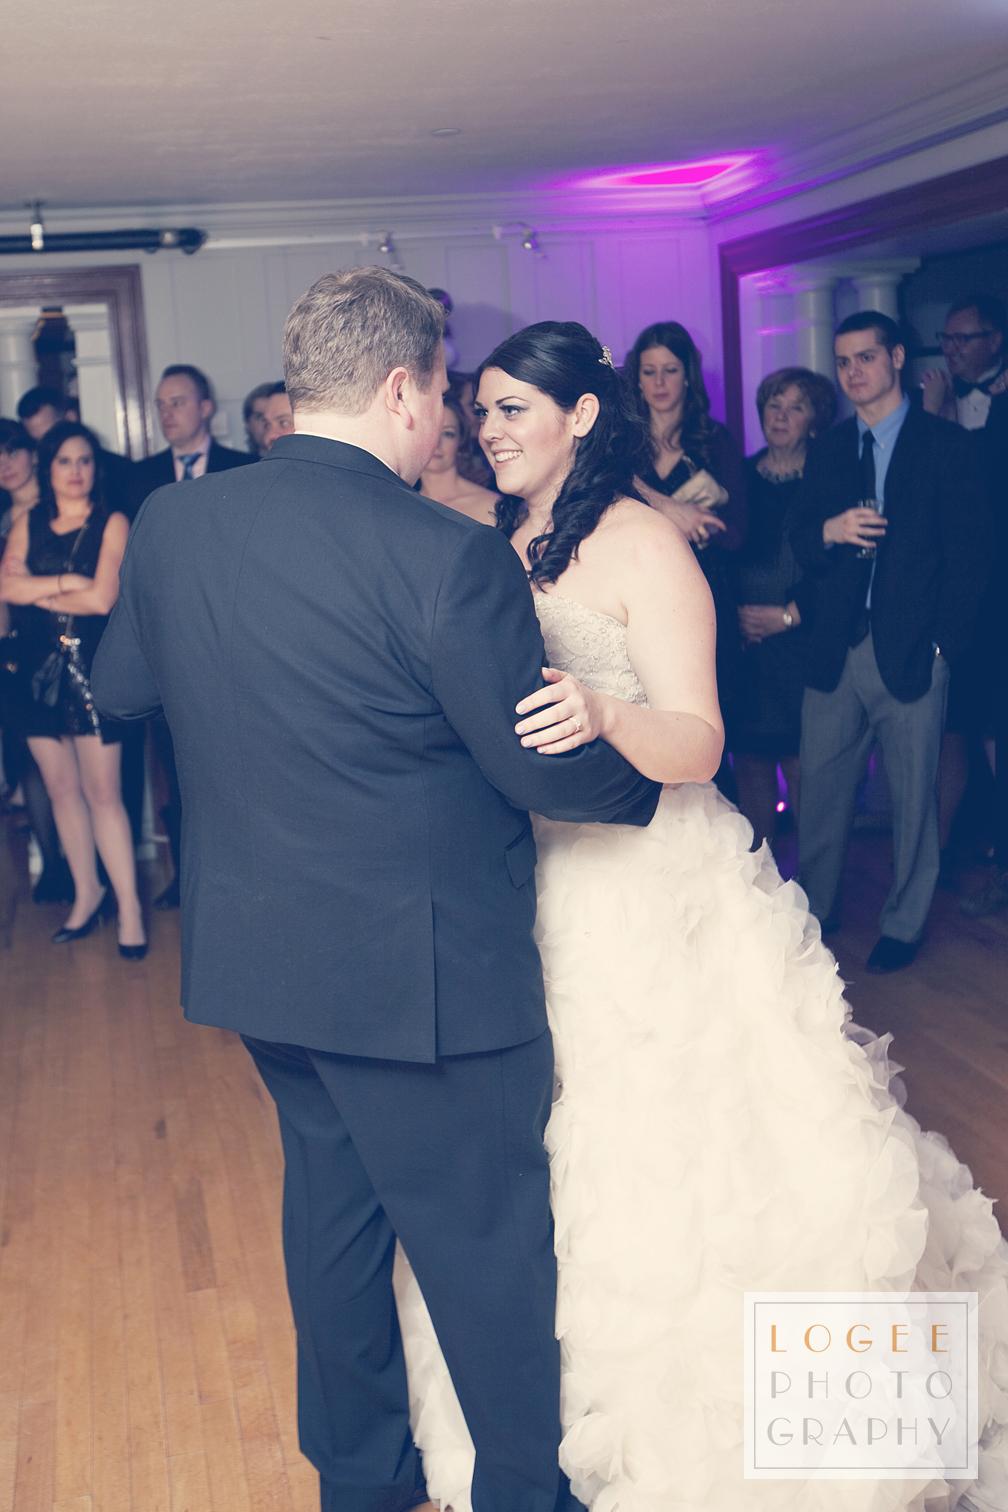 McIntosh-Burns Wedding - 7179Cw